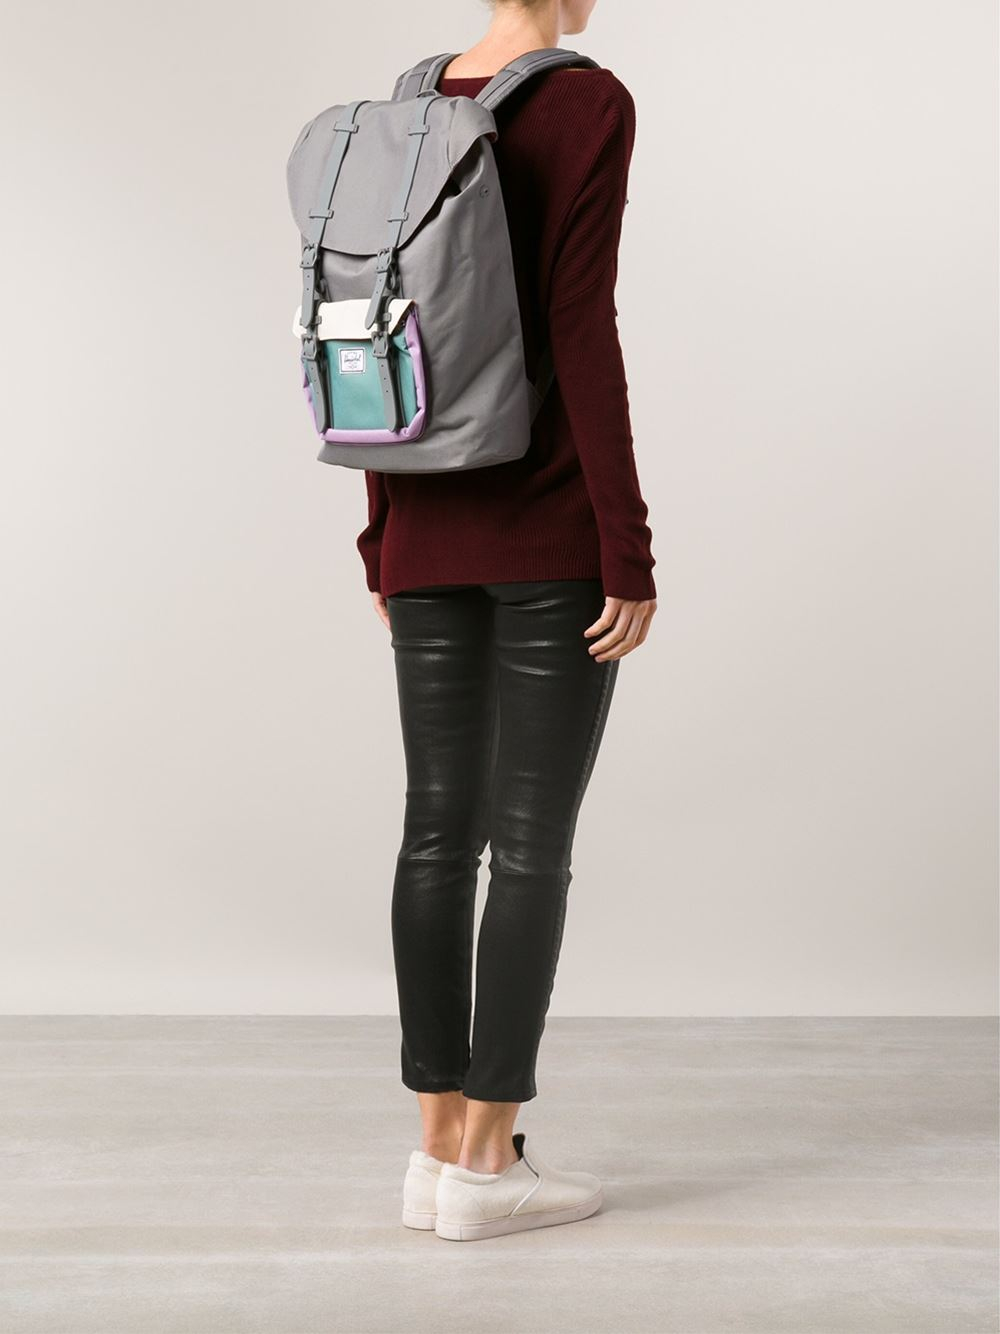 fcb0bfa3cb5 Lyst - Herschel Supply Co. Little America Midvolume Backpack in Gray ...